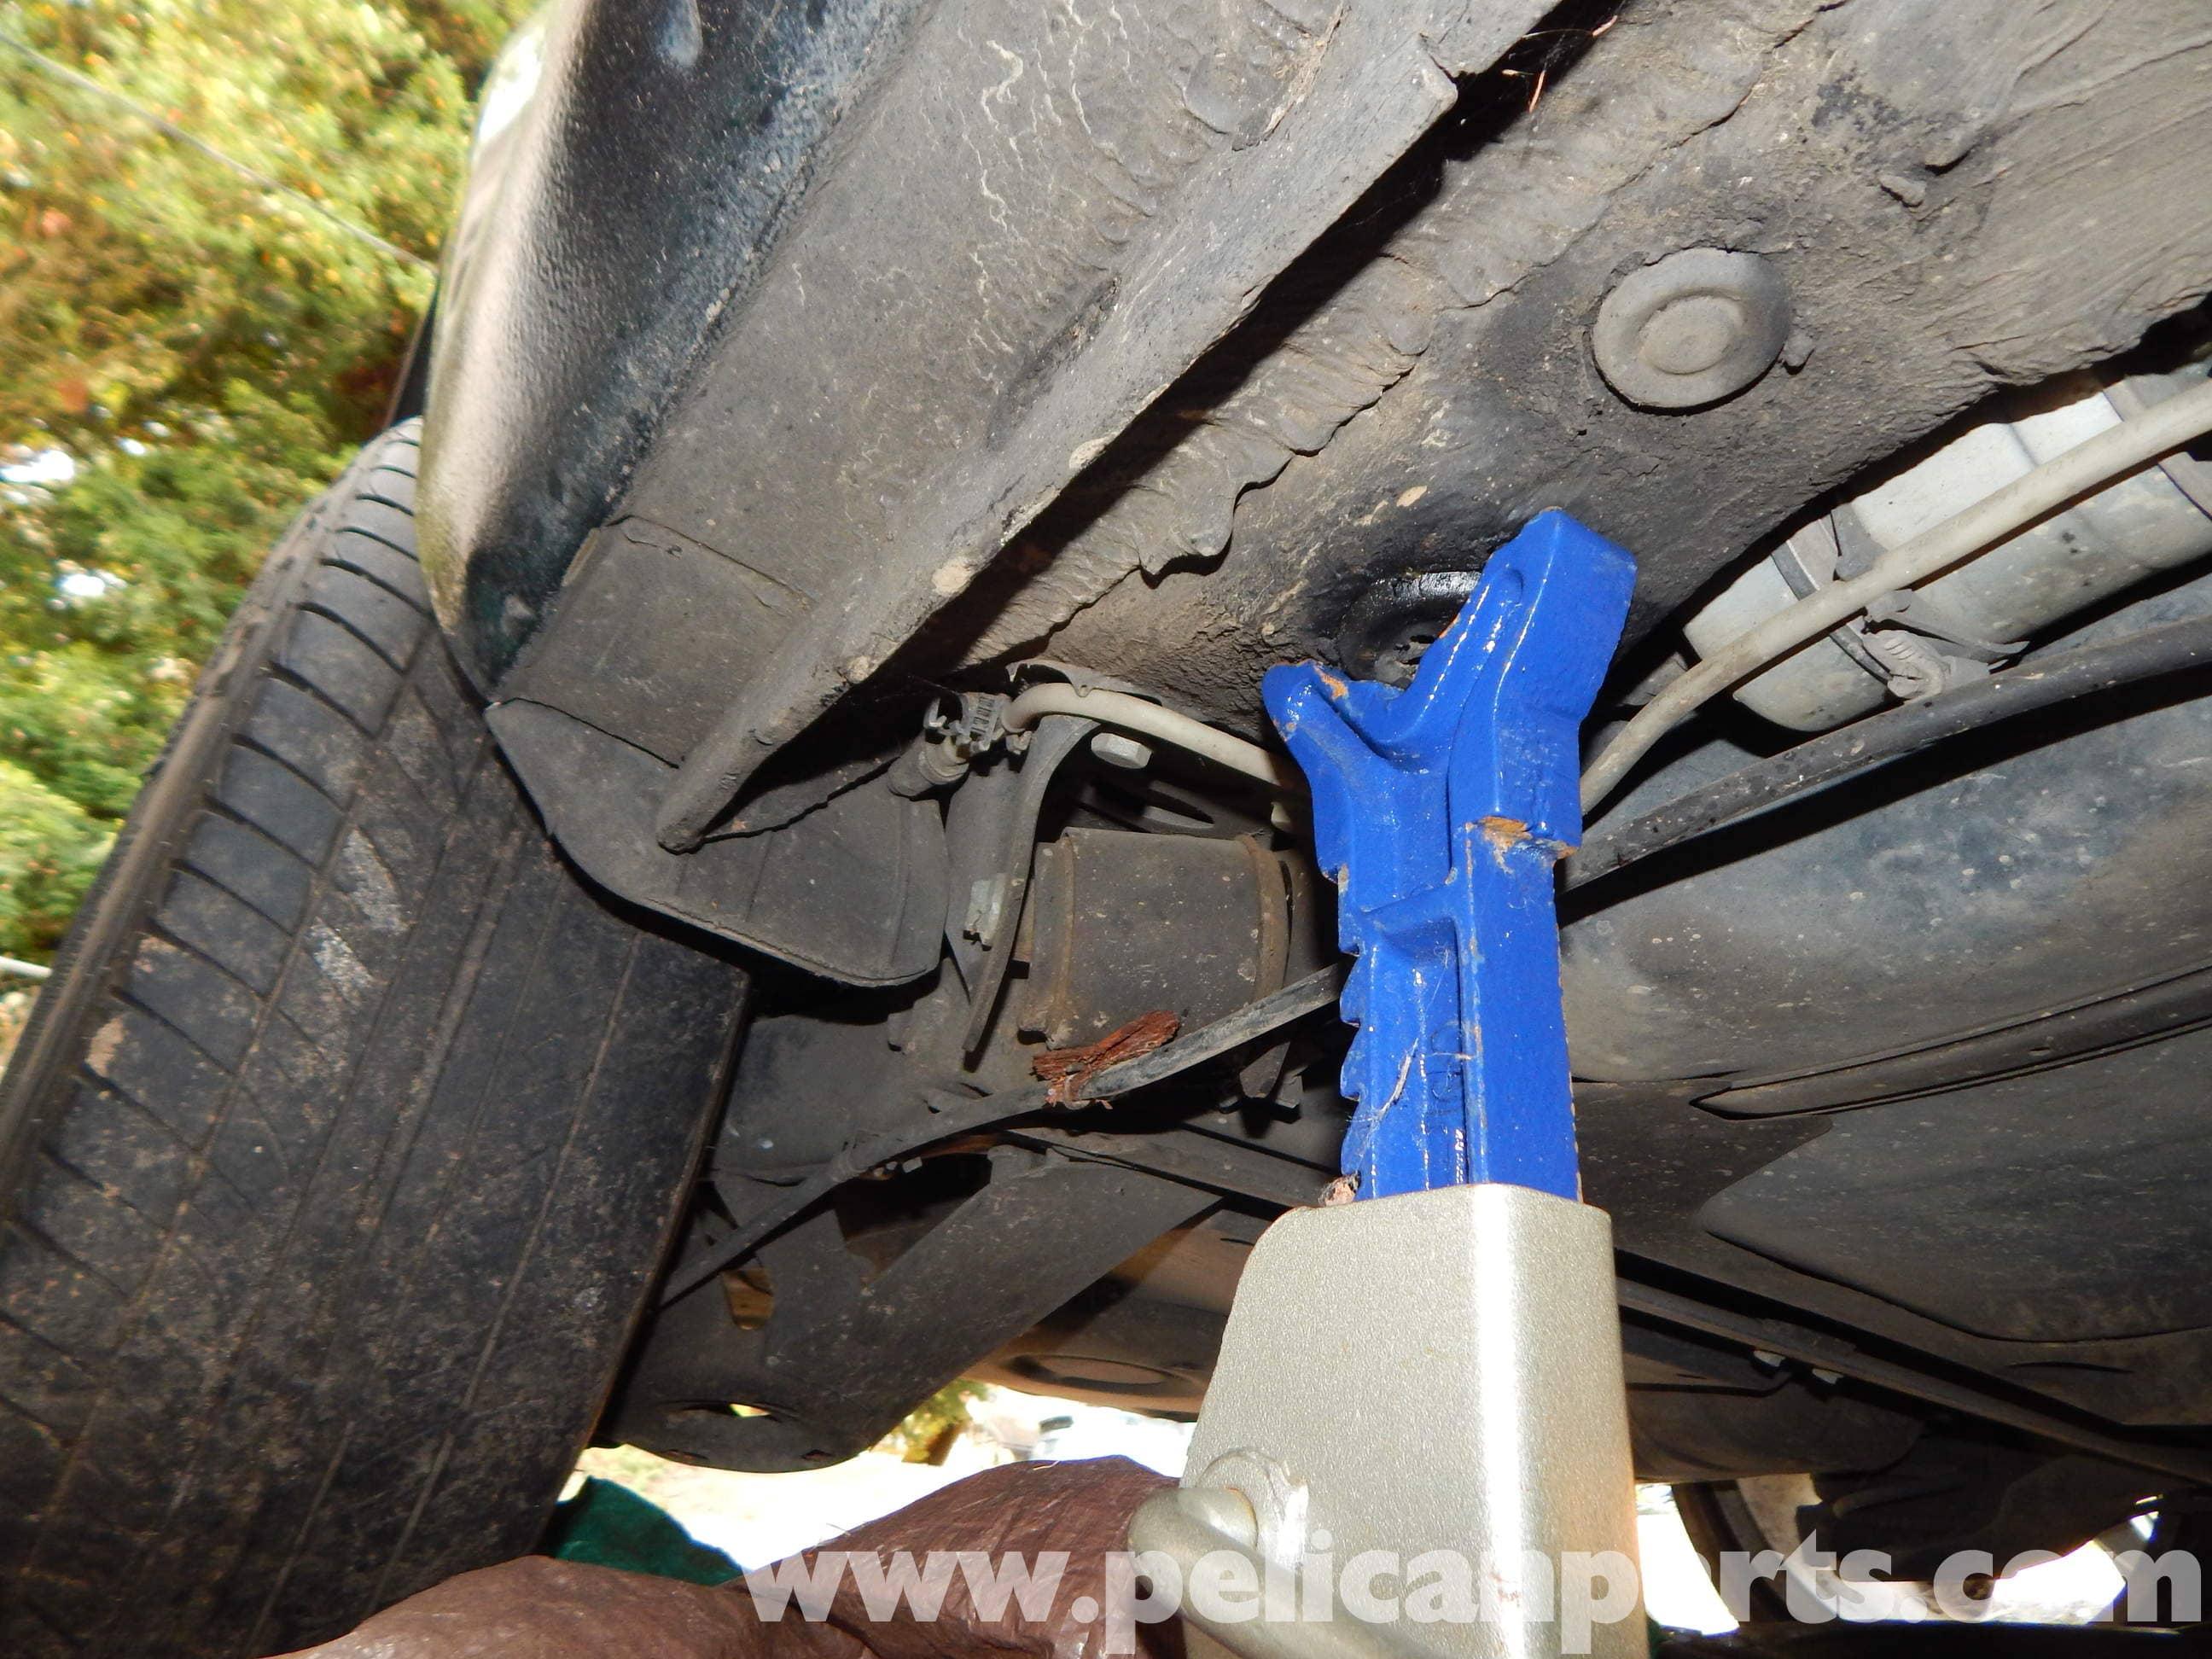 Volkswagen Jetta Mk4 Jacking Up Your Mk4 Jetta | Jetta Mk4 2.0L (1998-2005) | Pelican Parts DIY ...